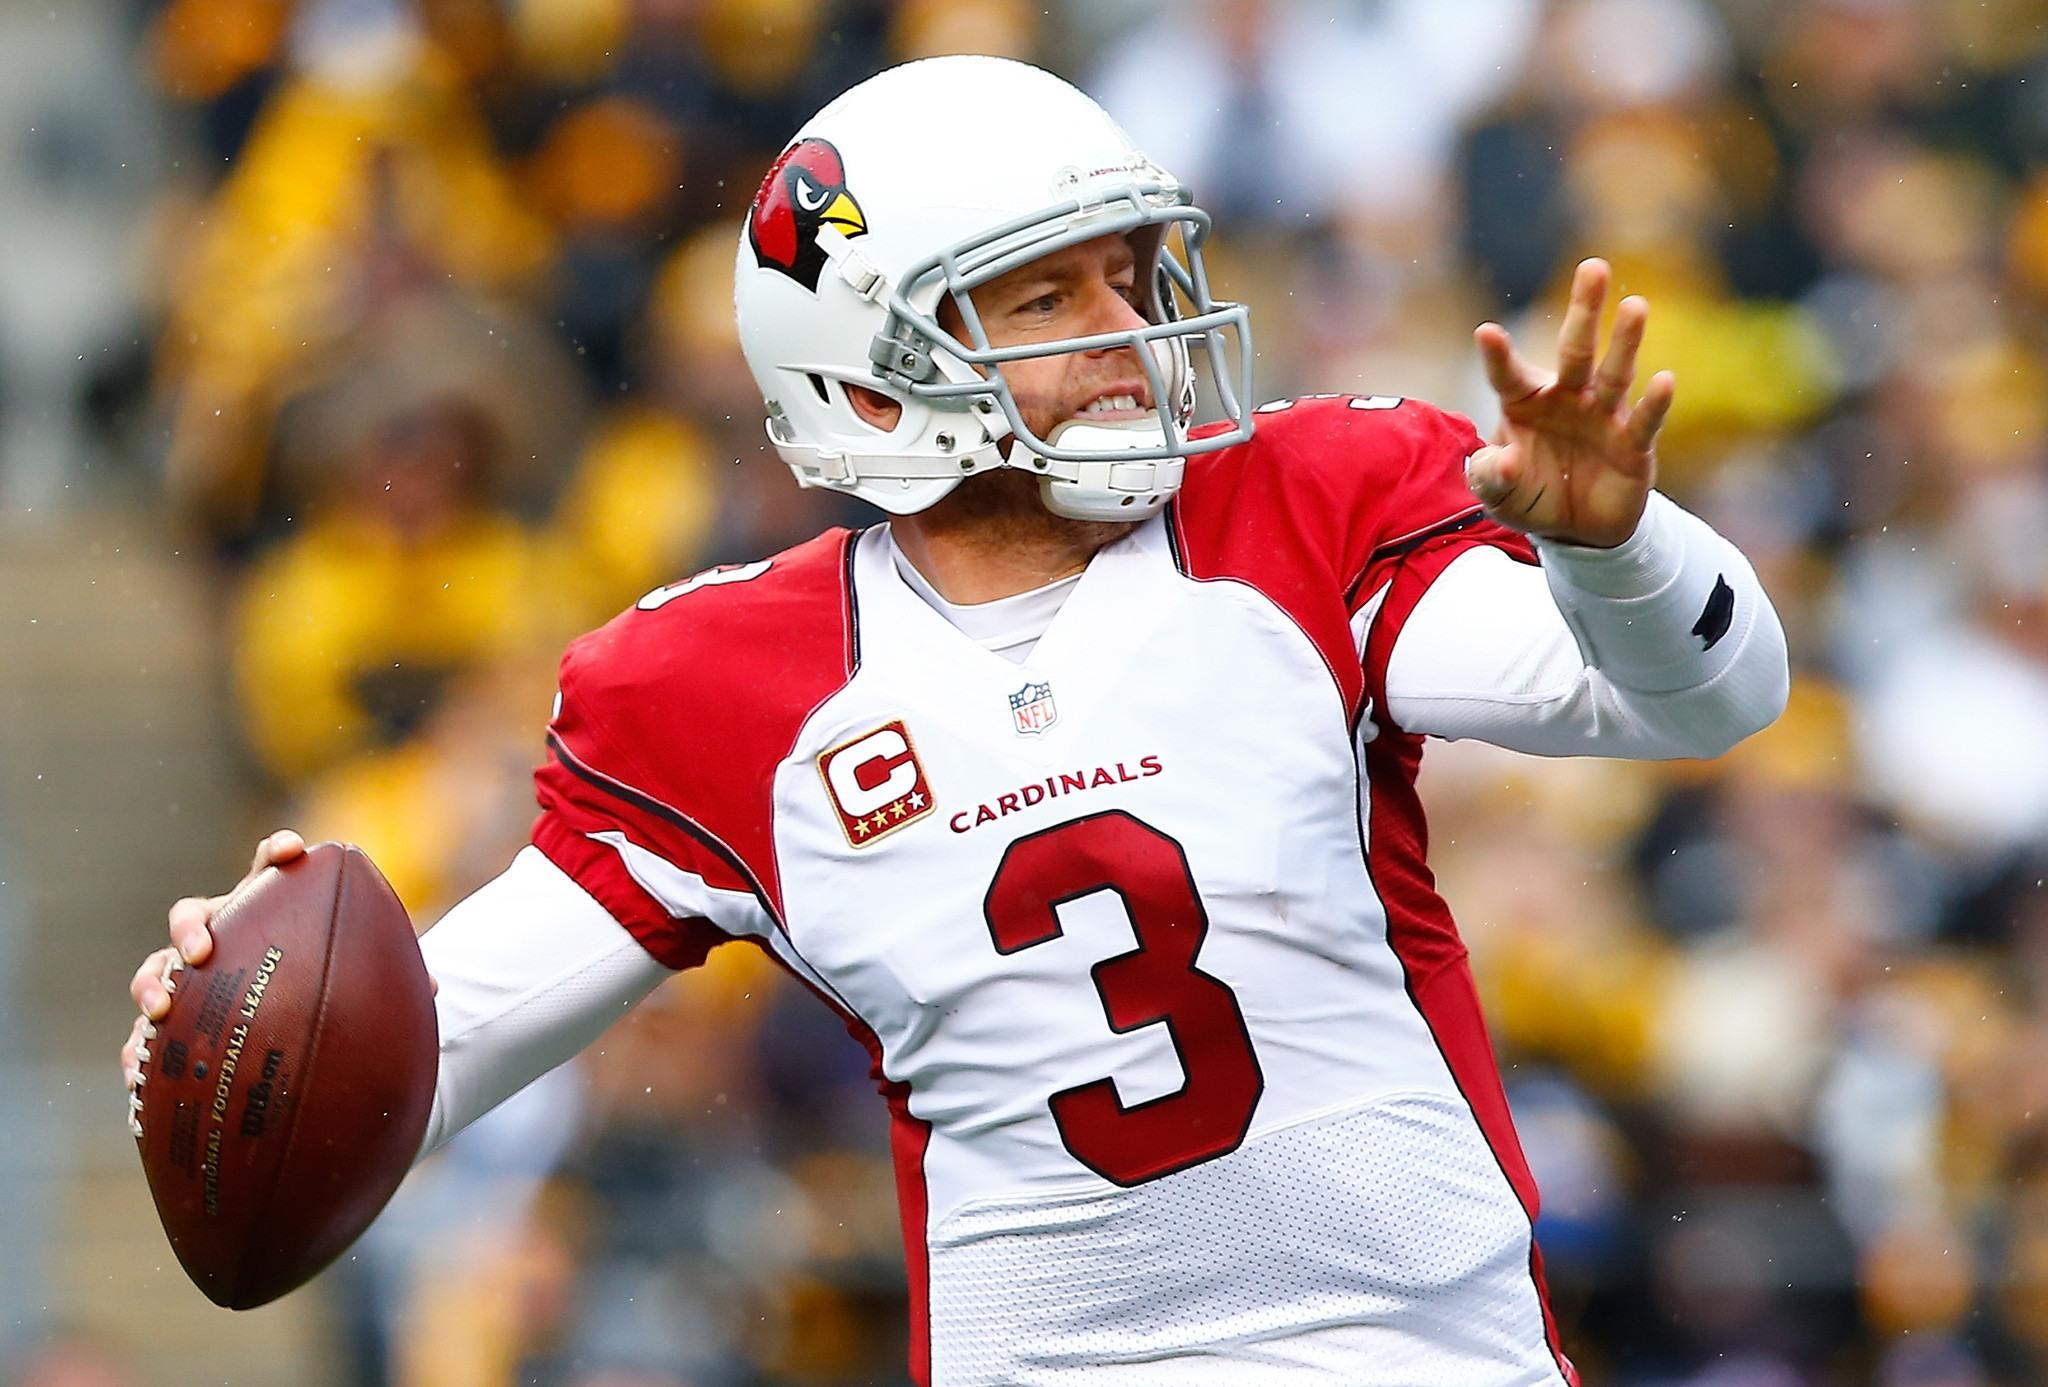 Cardinals - Carson Palmer